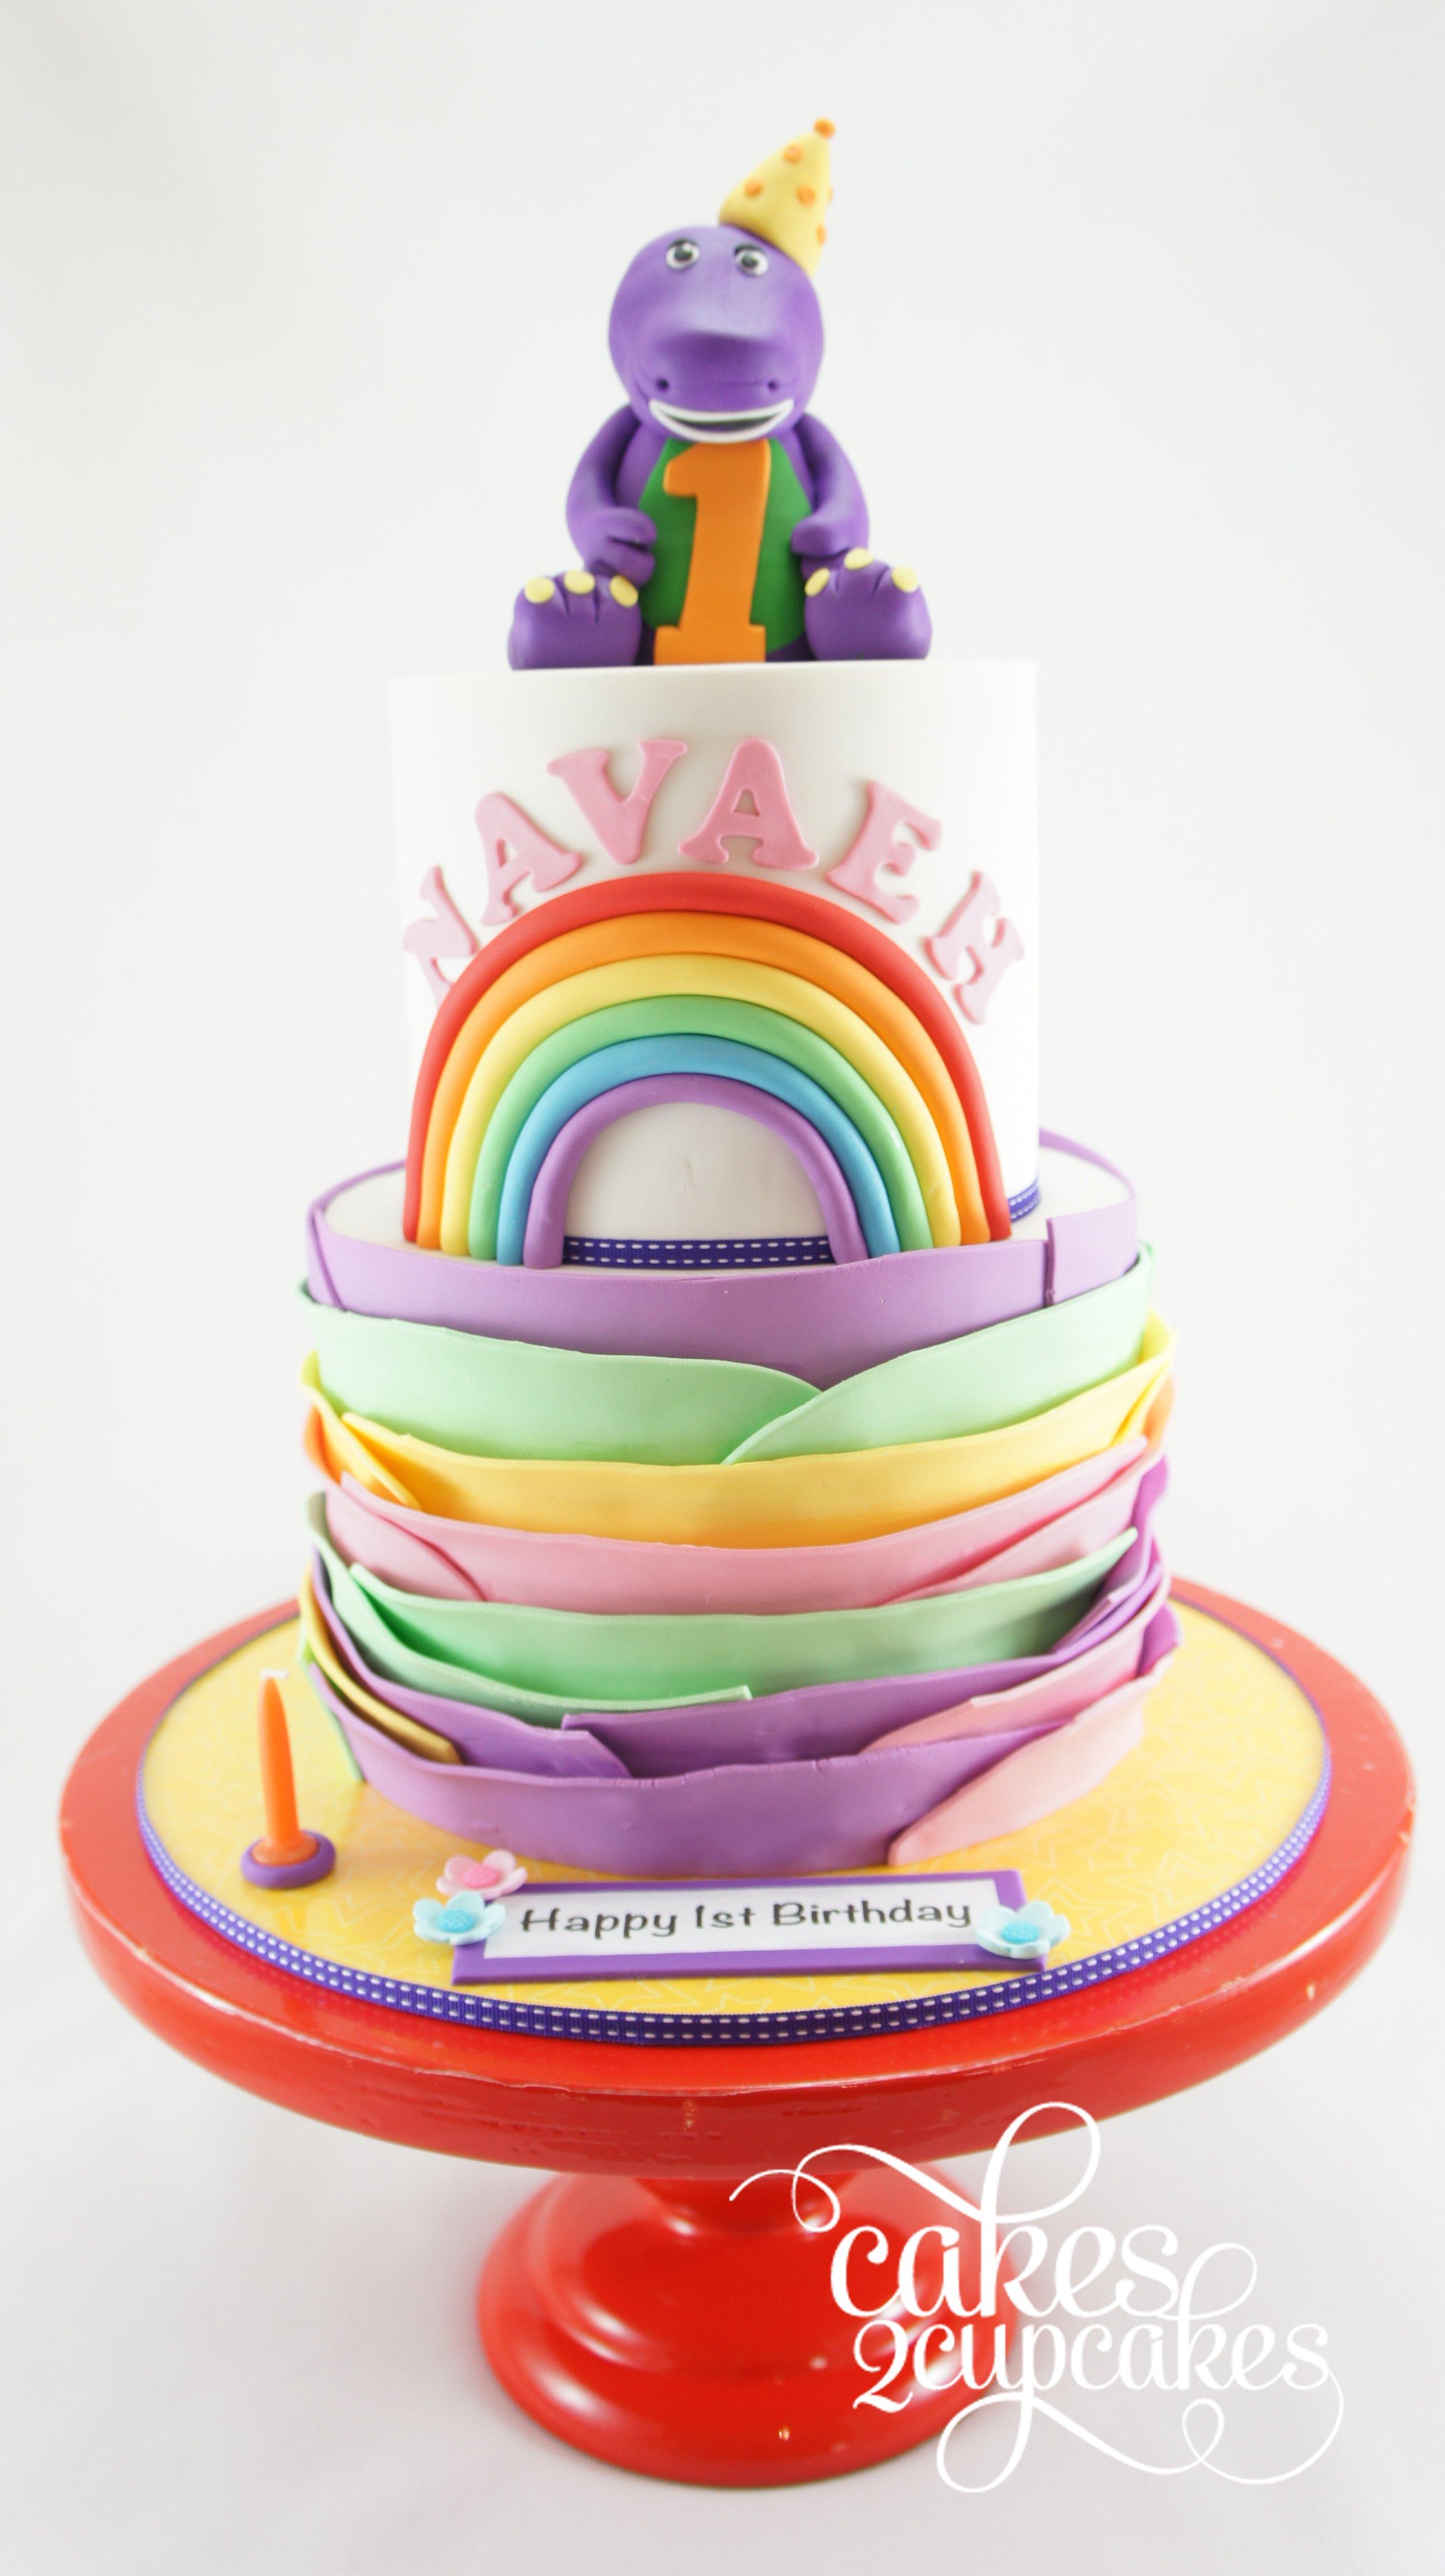 cakes2cupcakes-barney.jpg